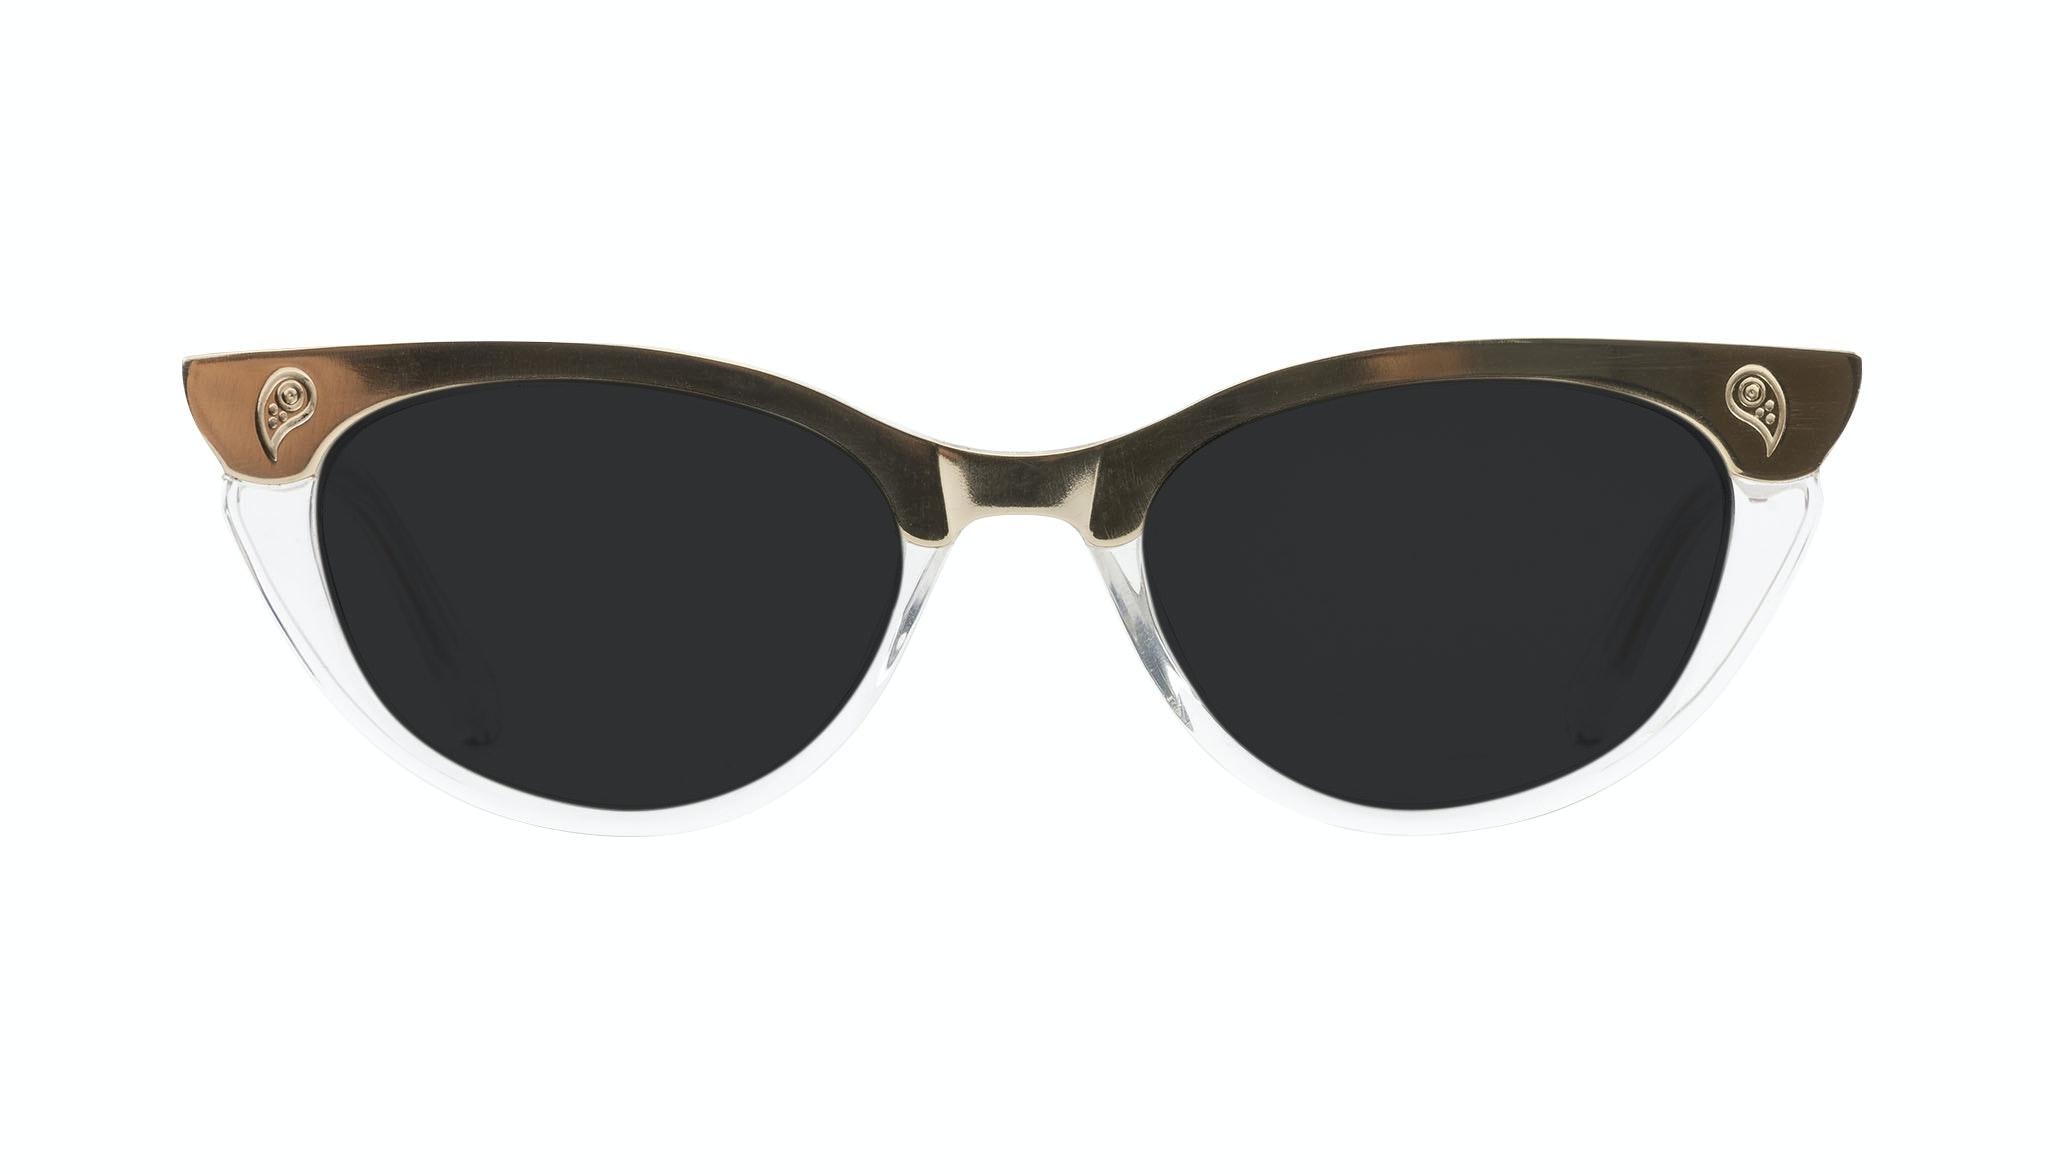 Affordable Fashion Glasses Cat Eye Daring Cateye Sunglasses Women Bad Beti Babbu Front